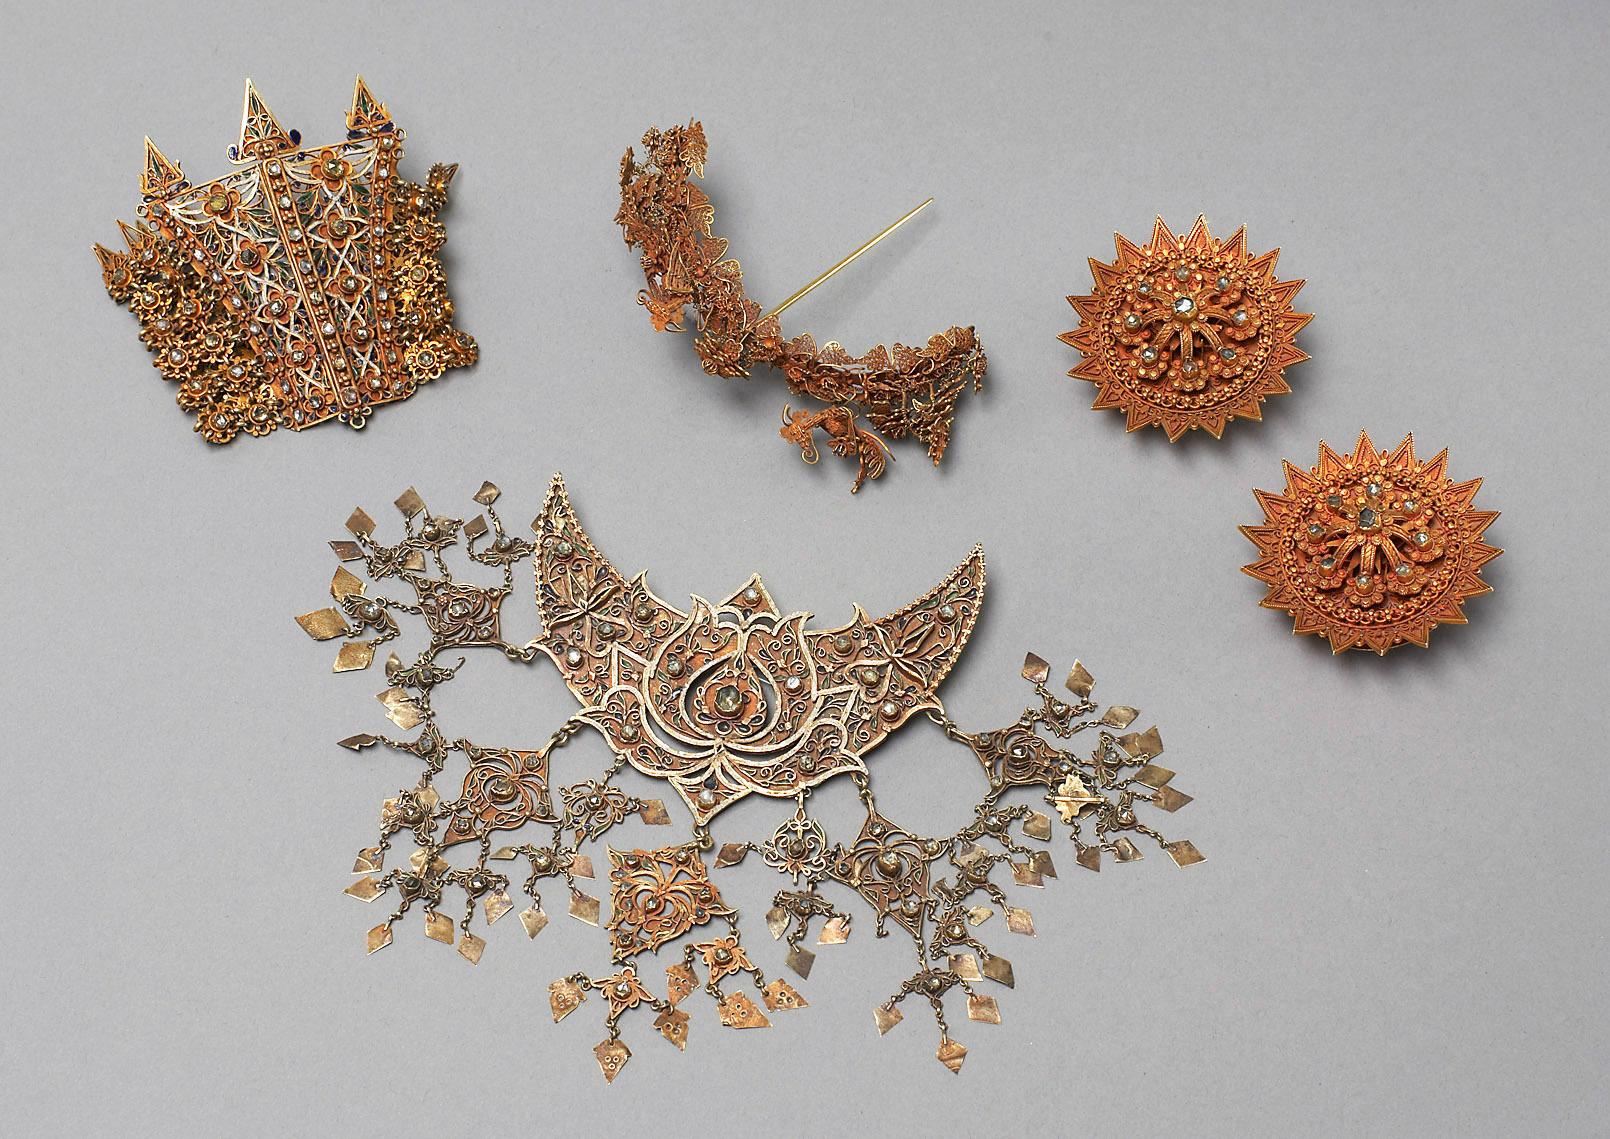 Schmuck aus Aceh: Brustschmuck, Haarnadel, Ohrknöpfe, Armband